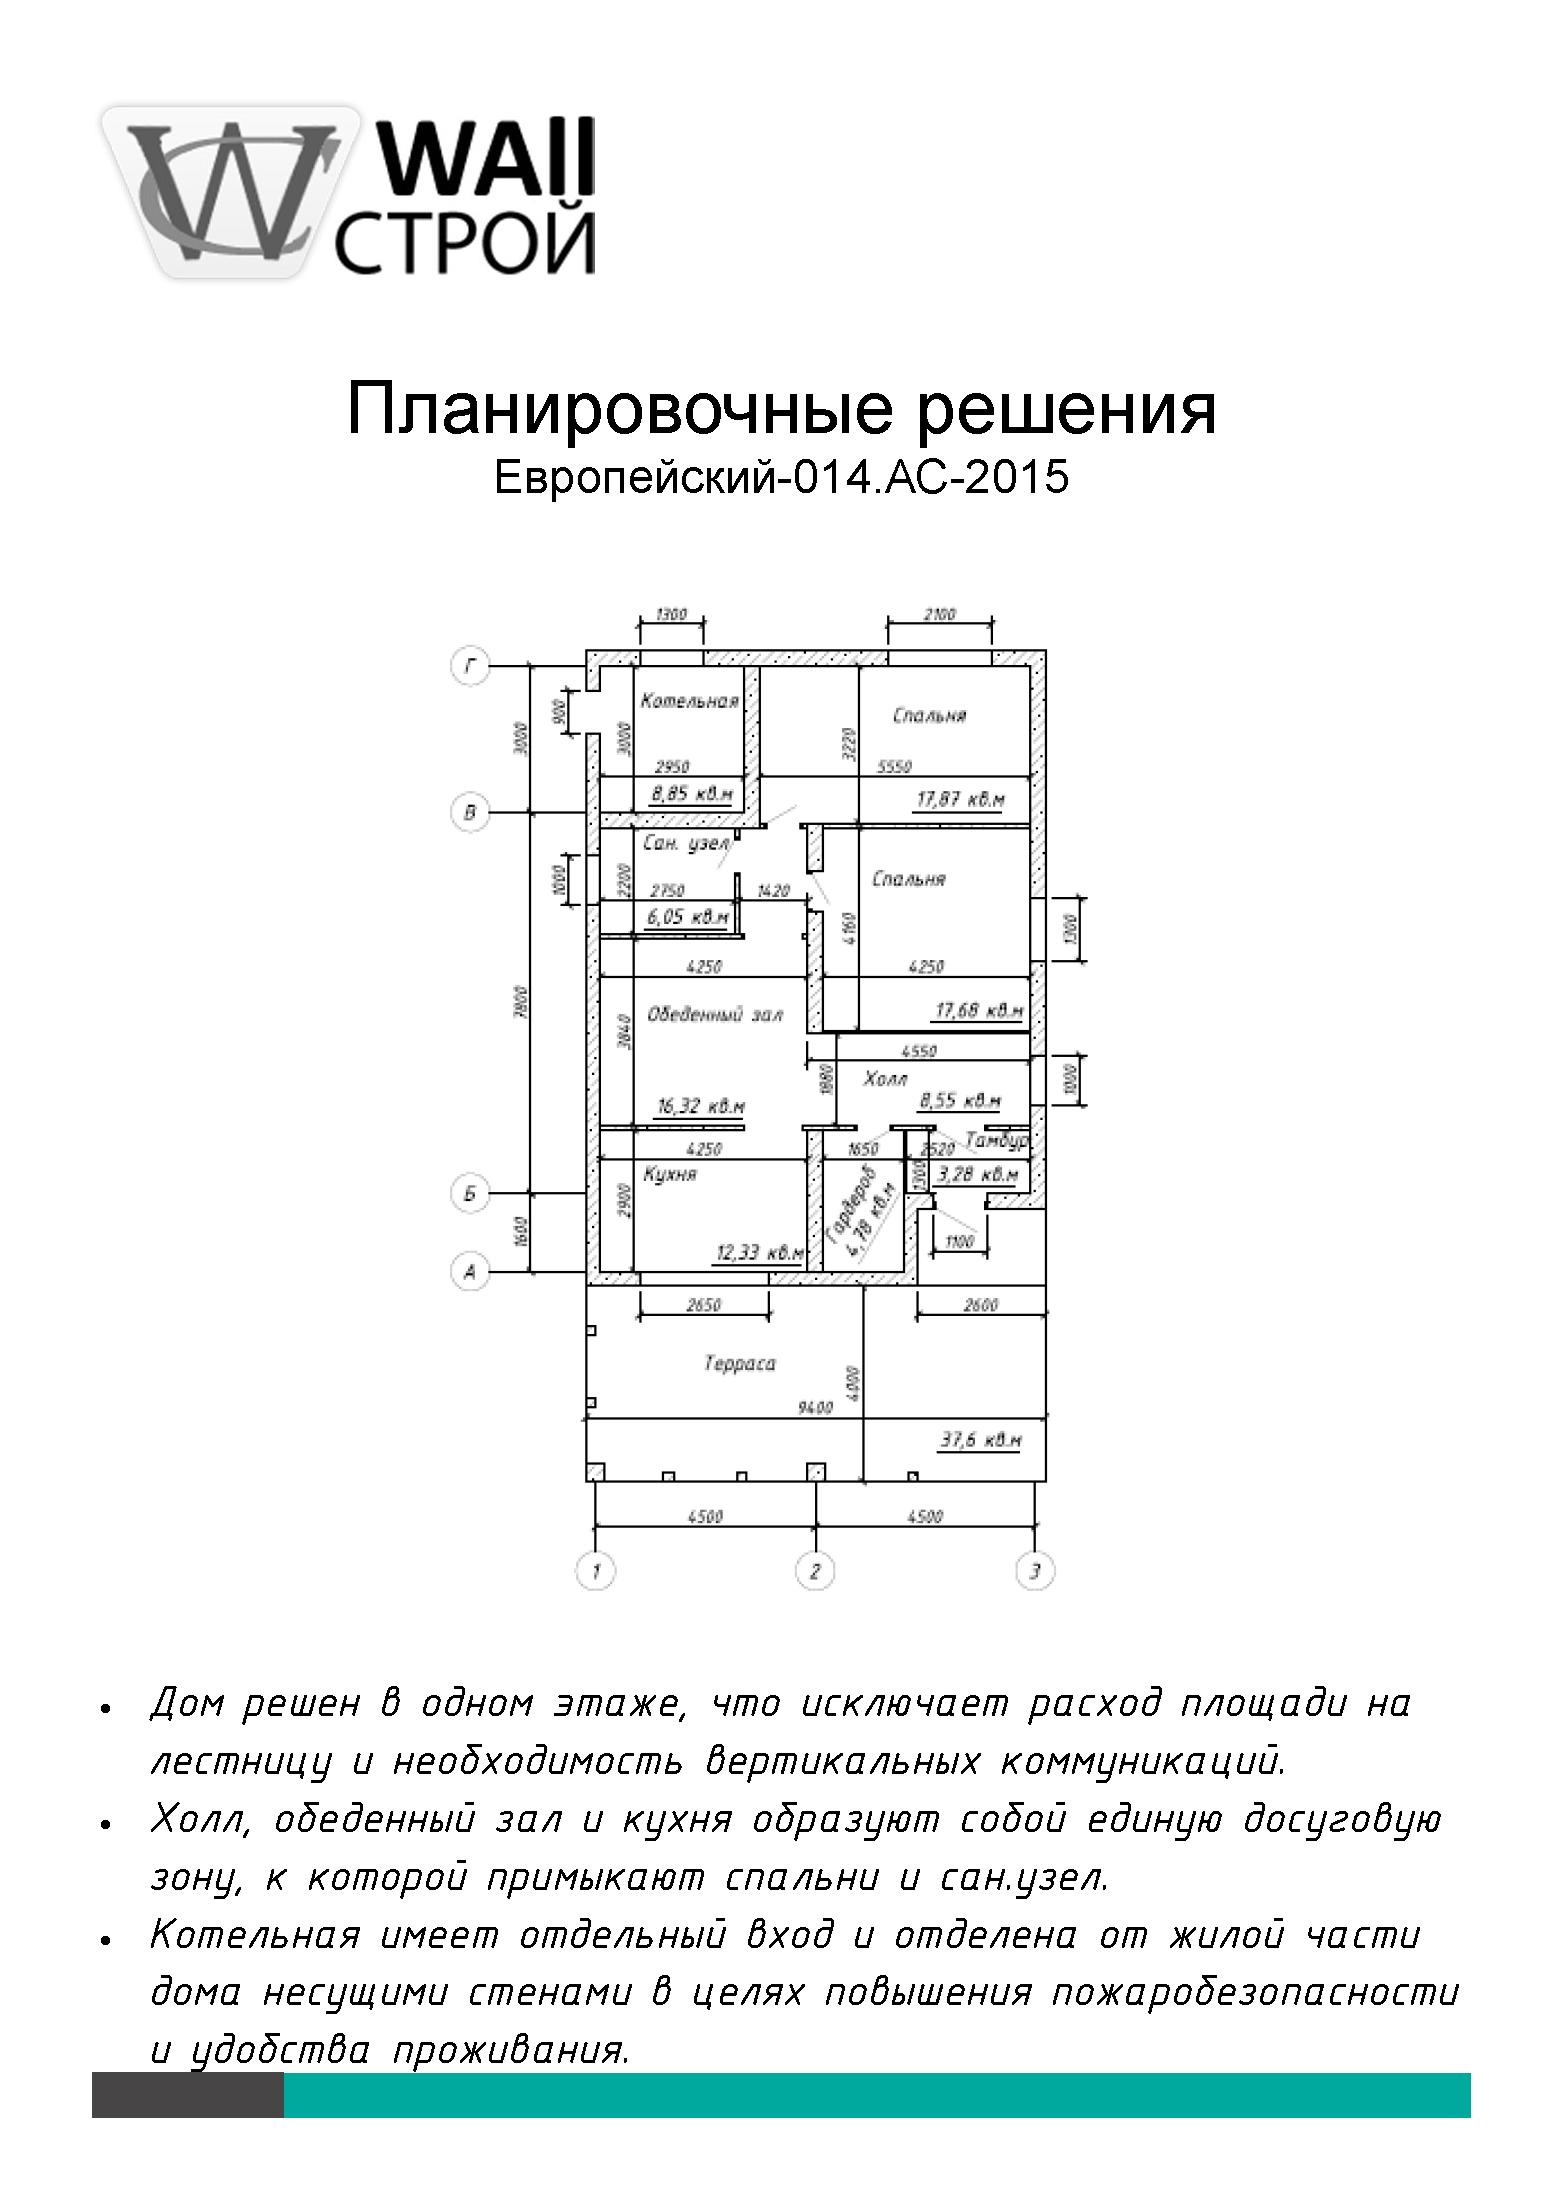 -014-Европейский- план